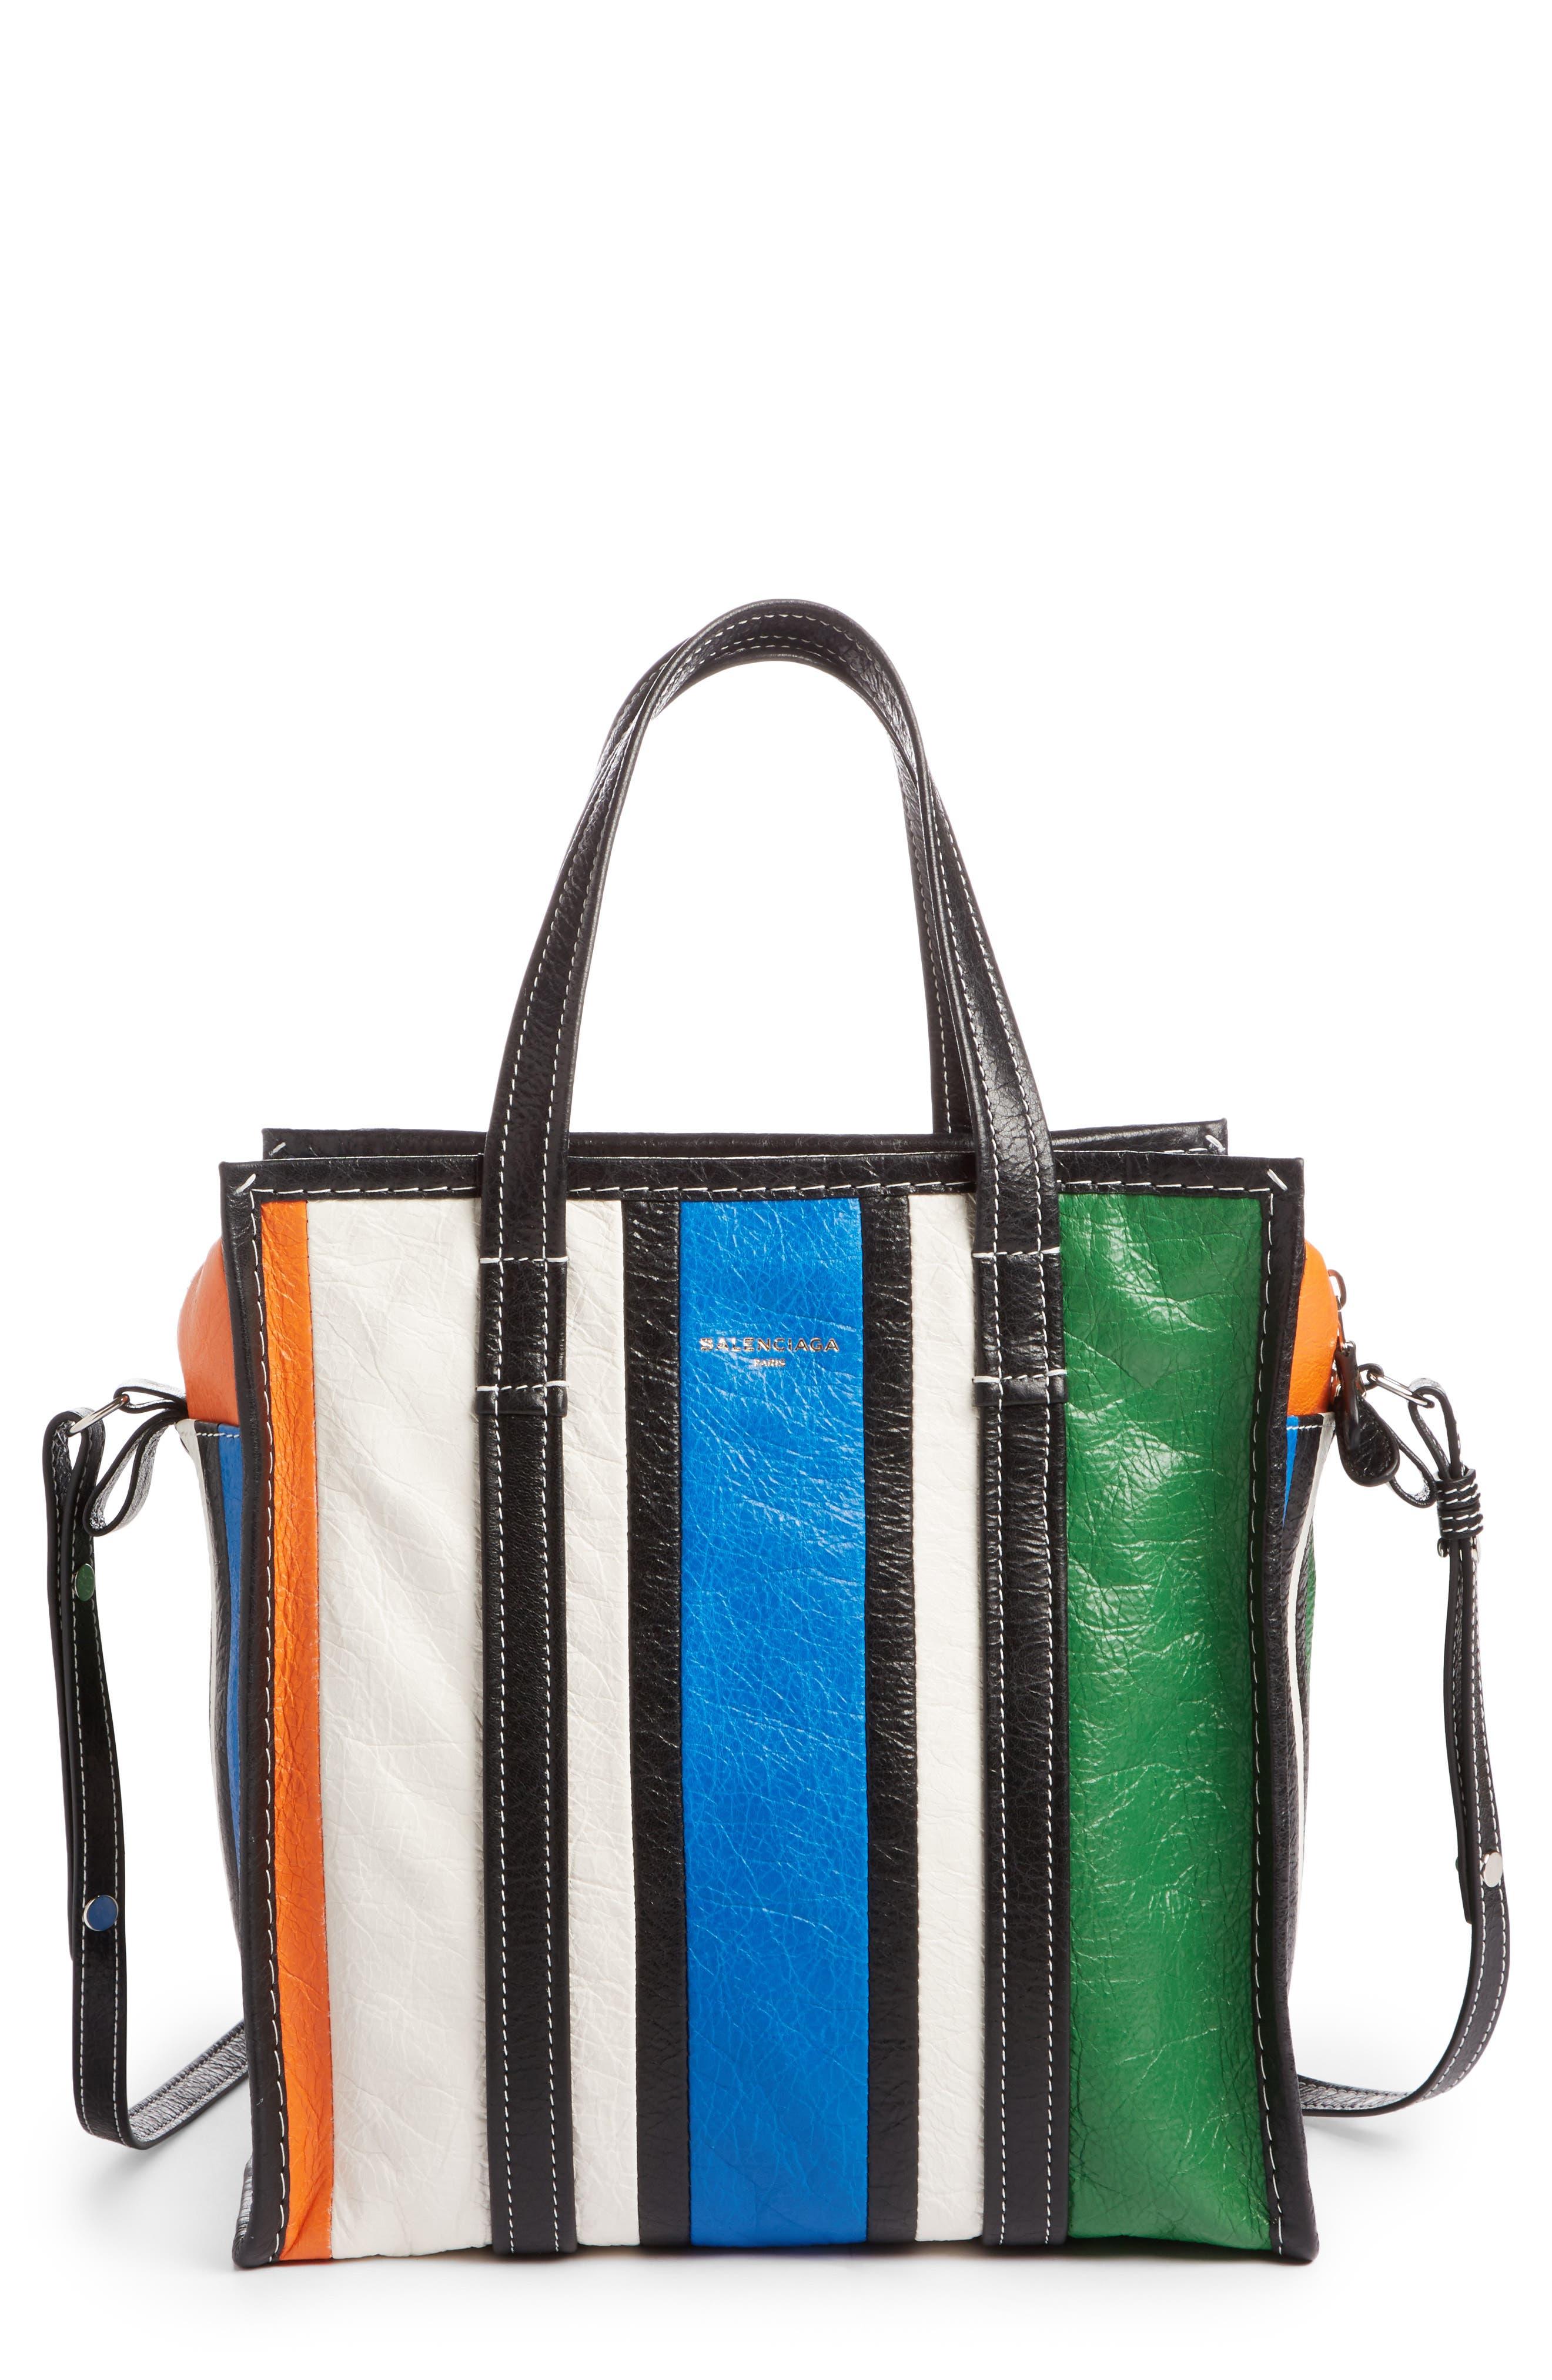 Extra Small Bazar Leather Shopper,                         Main,                         color, Orange/ Blue/ Vert/ Navy